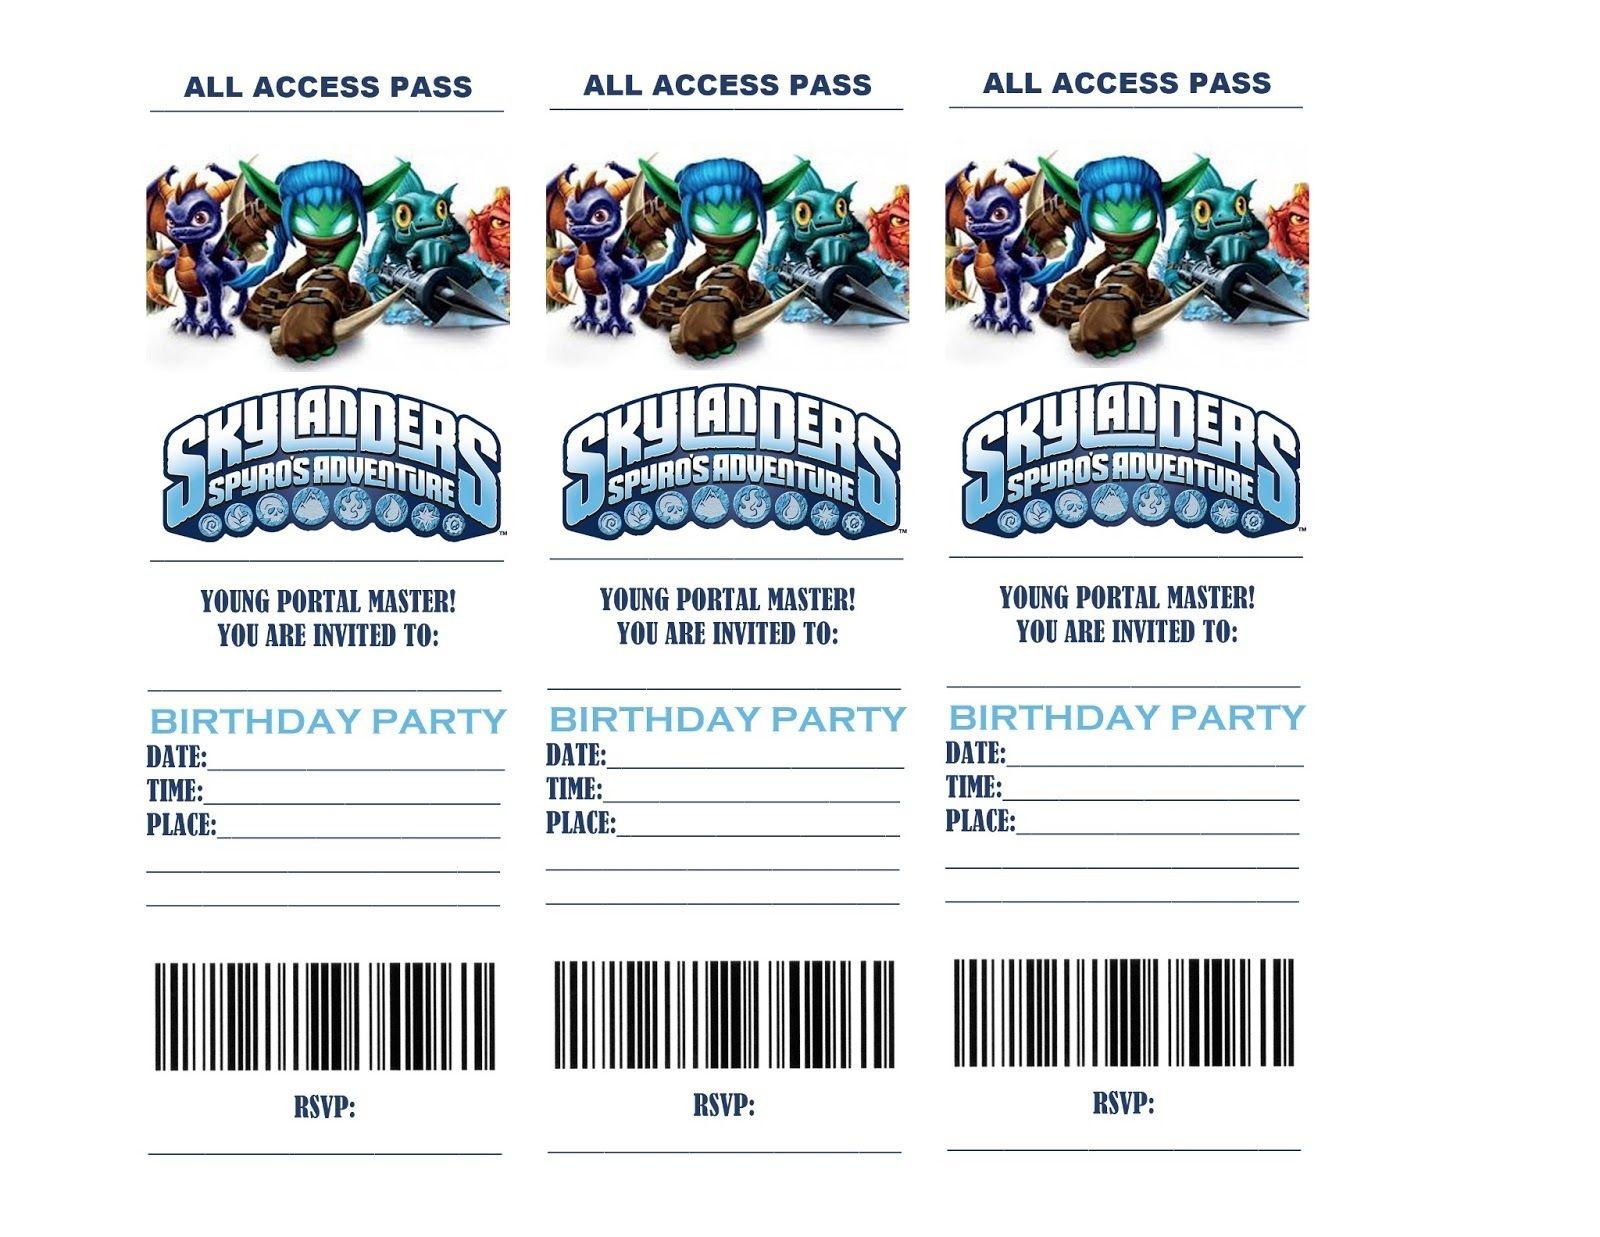 Skylanders Birthday Party Invitations   Life In A Larger Story - Free Printable Skylander Invitations